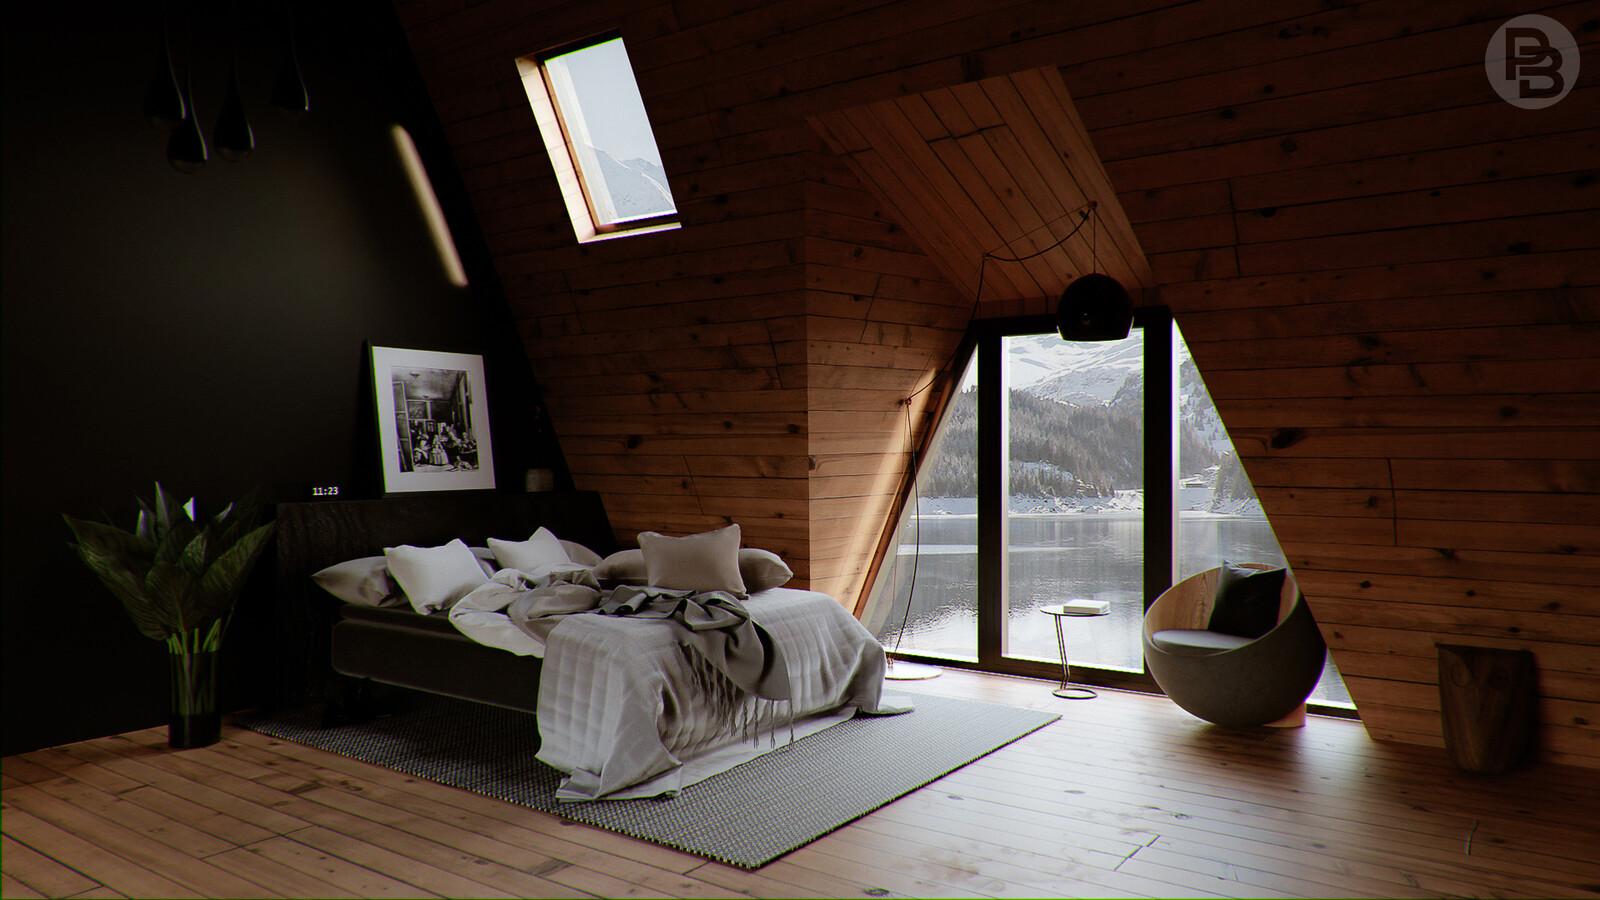 Realistic bedroom in wintery landscape